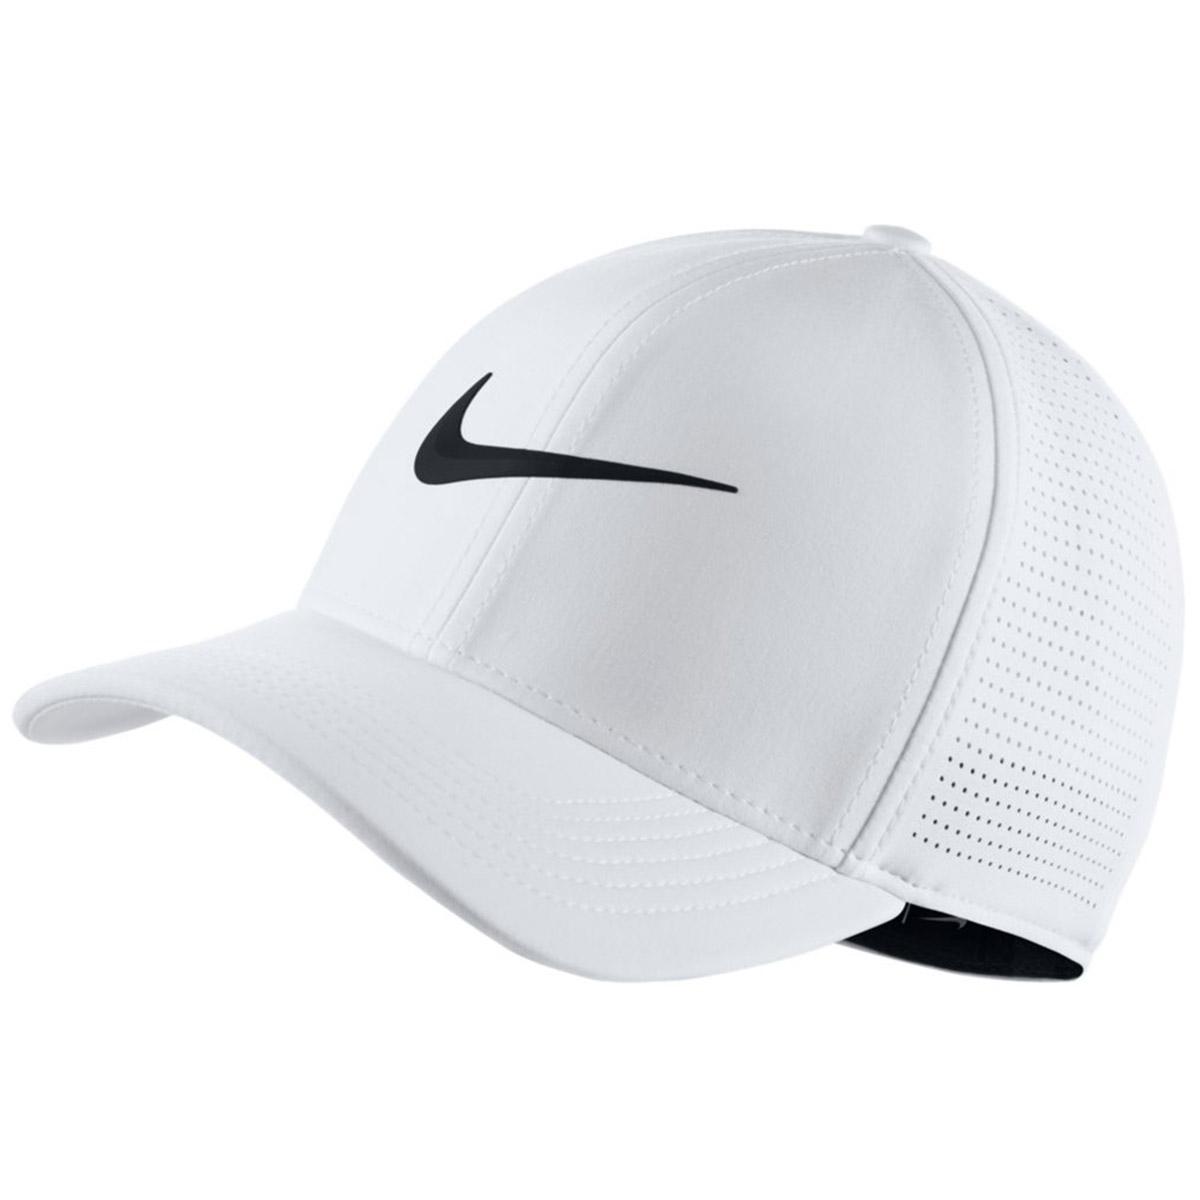 4e84150e720 Nike Golf AeroBill Classic 99 Cap